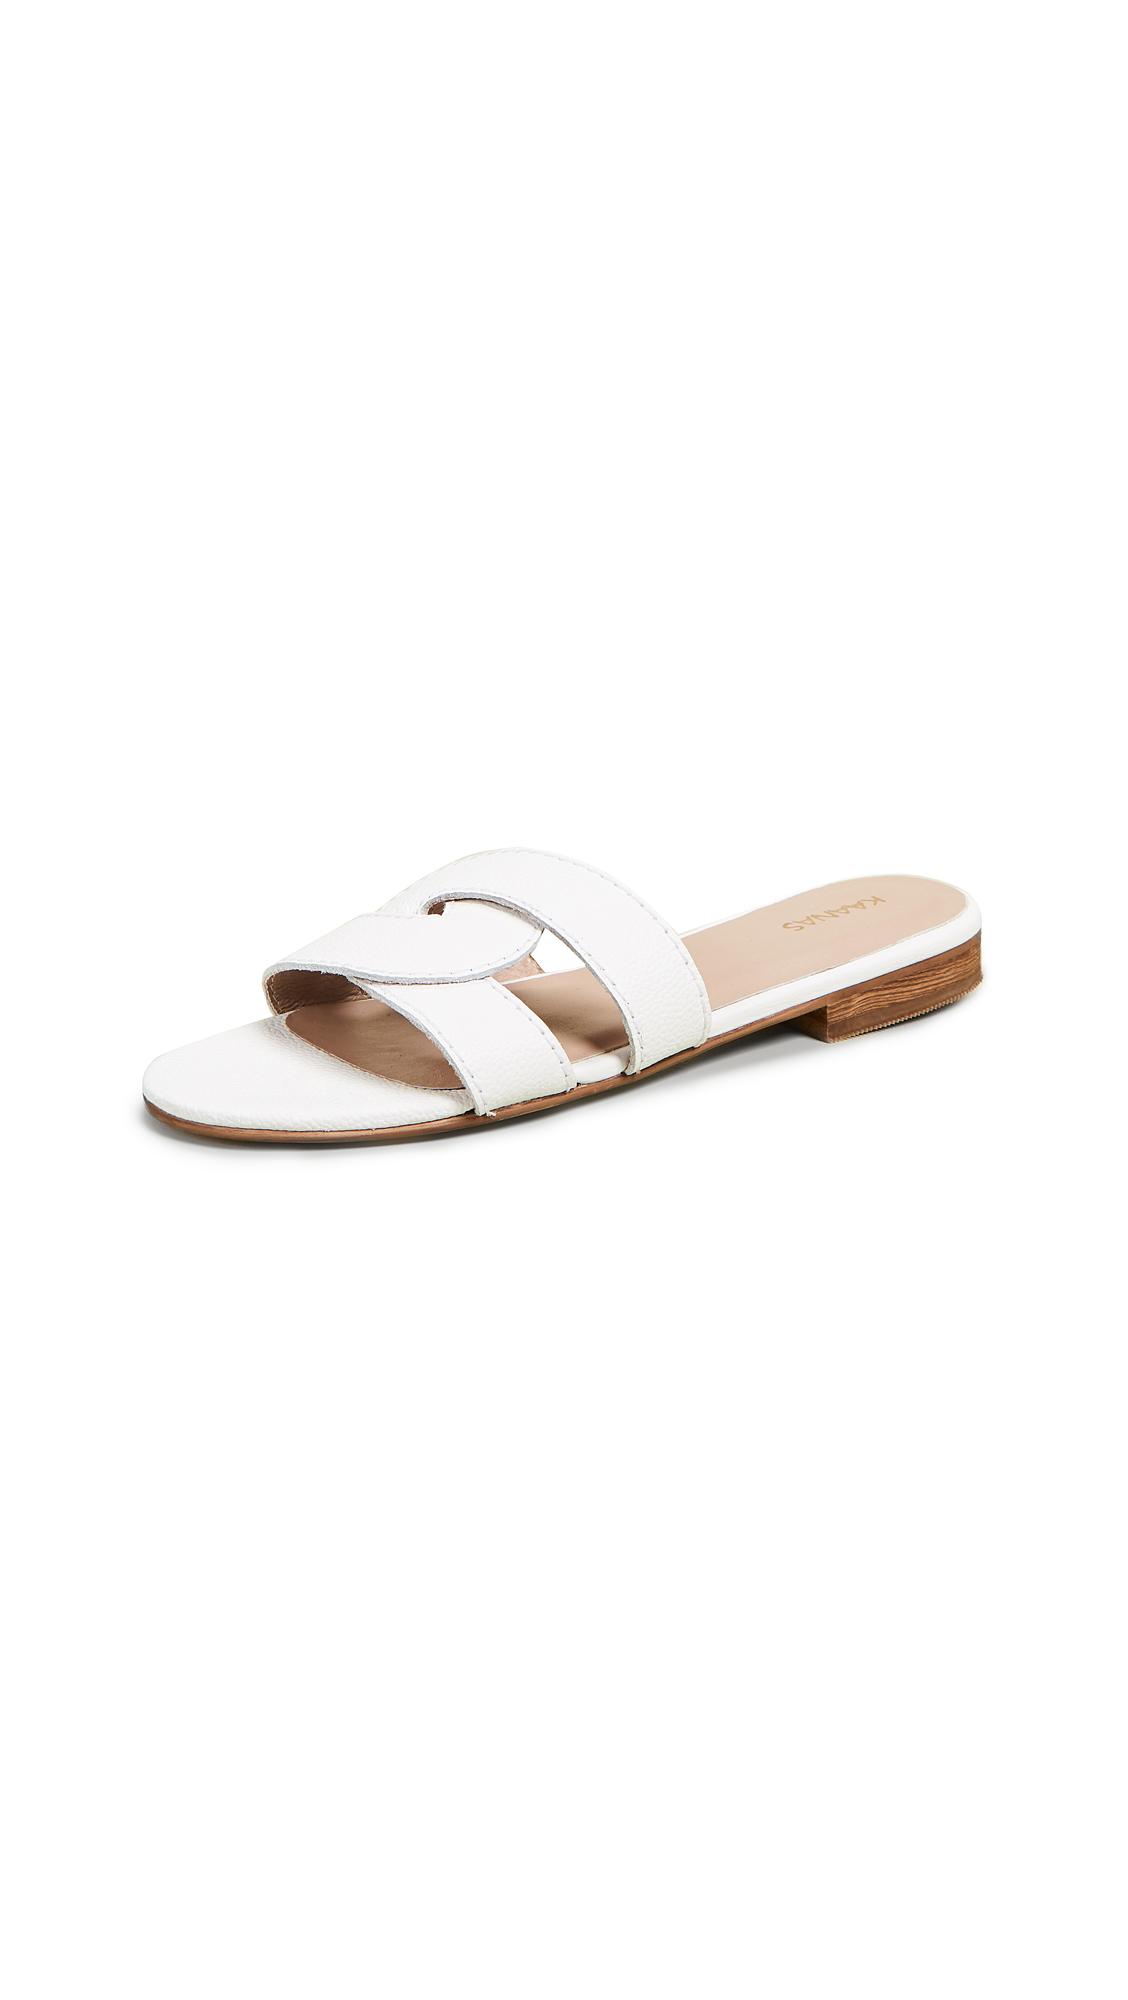 KAANAS Santorini Infinity Sandals - White